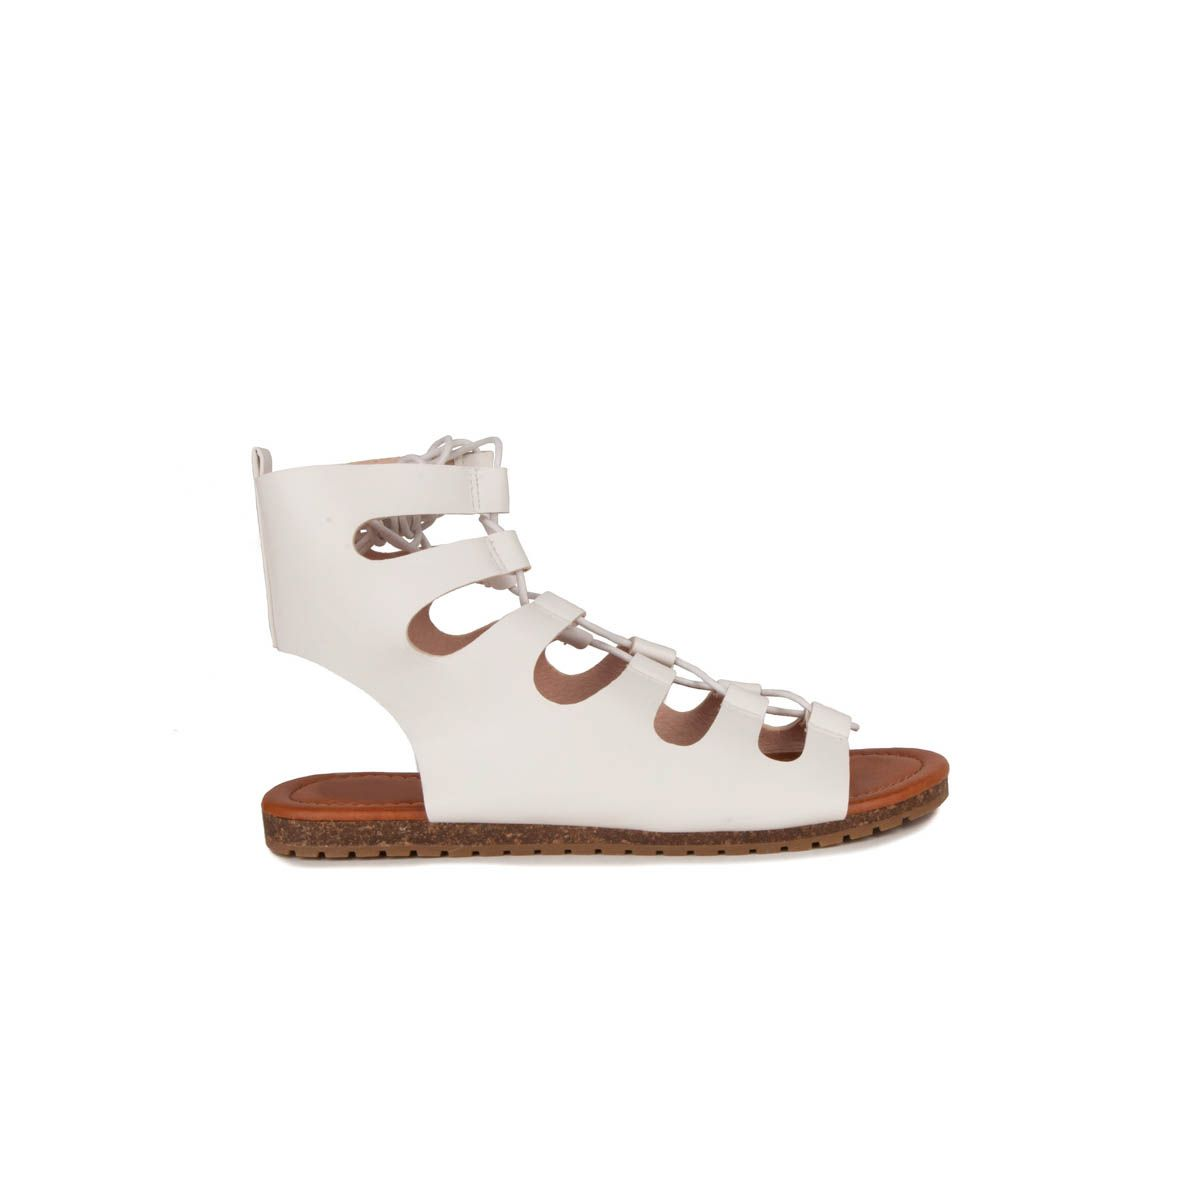 Montevita Lace Up Flat Sandal in White